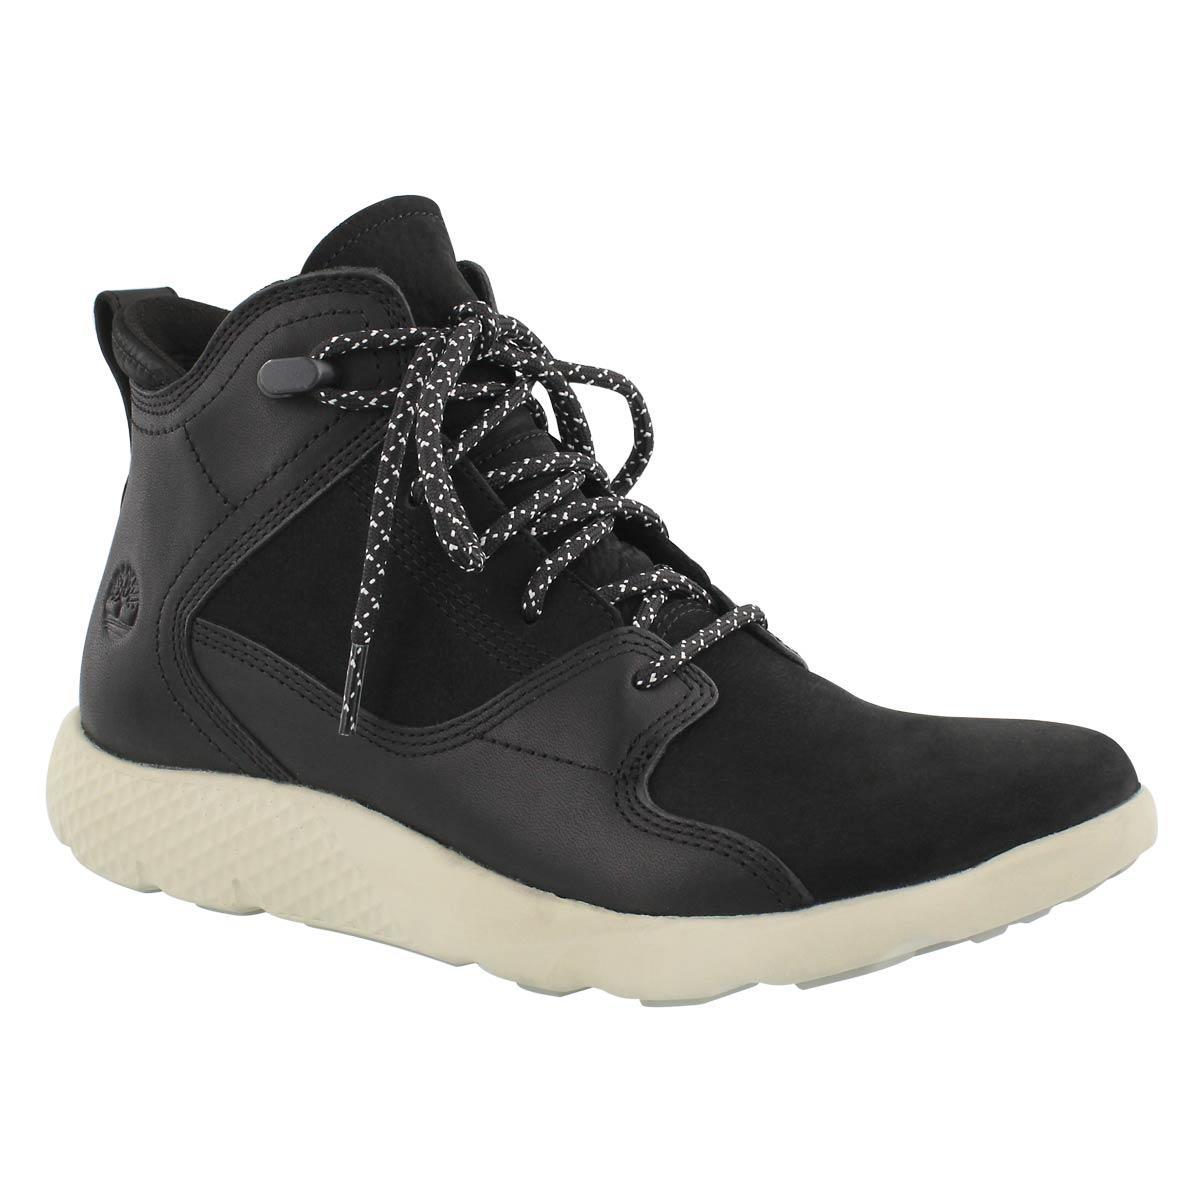 Women's FLY ROAM black hiking boots